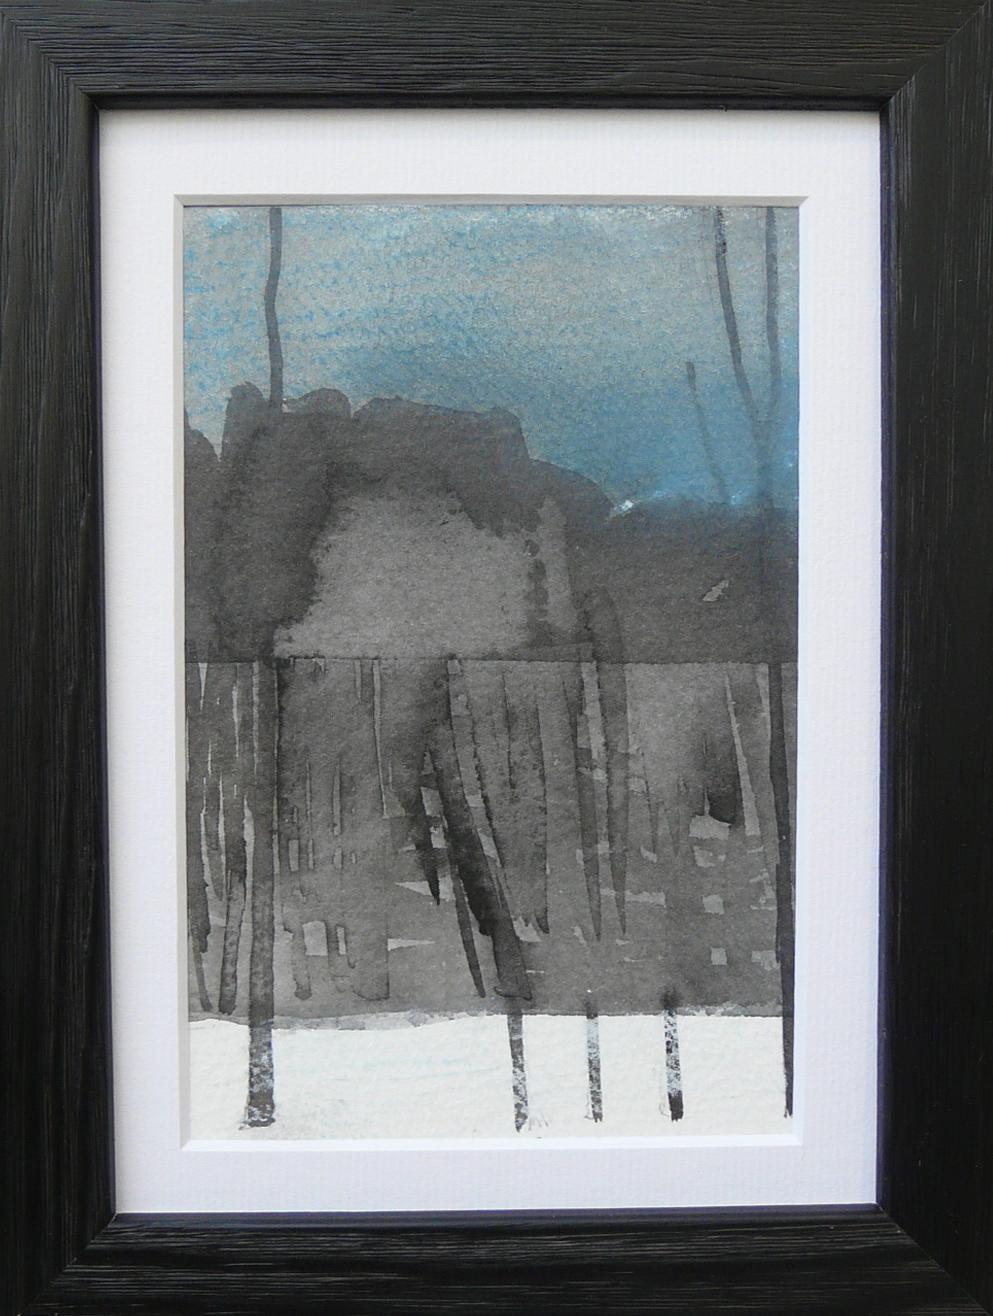 Miniatures 4. Ink, oil, pastel, paper. 15x10cm. 2013